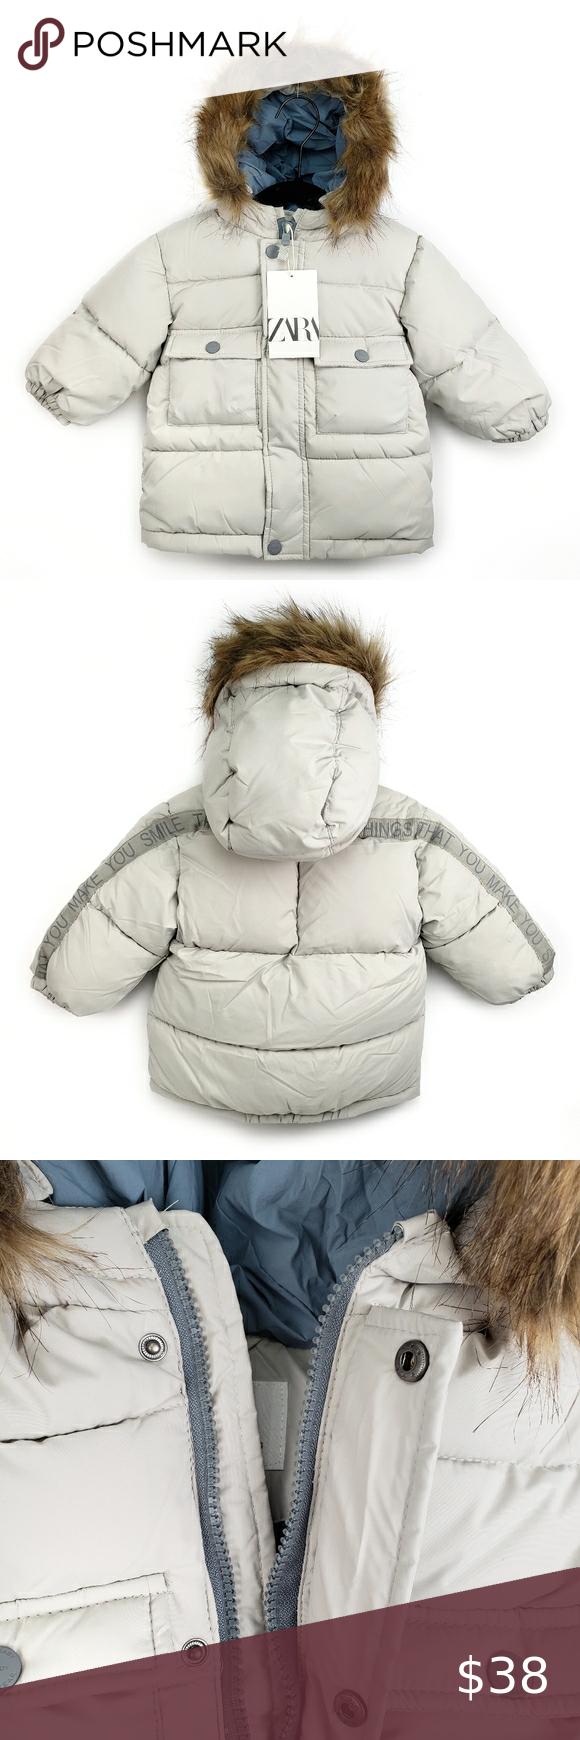 NEW Zara Baby Fleece Puffer Jacket With Hood NWT in 2020 ...